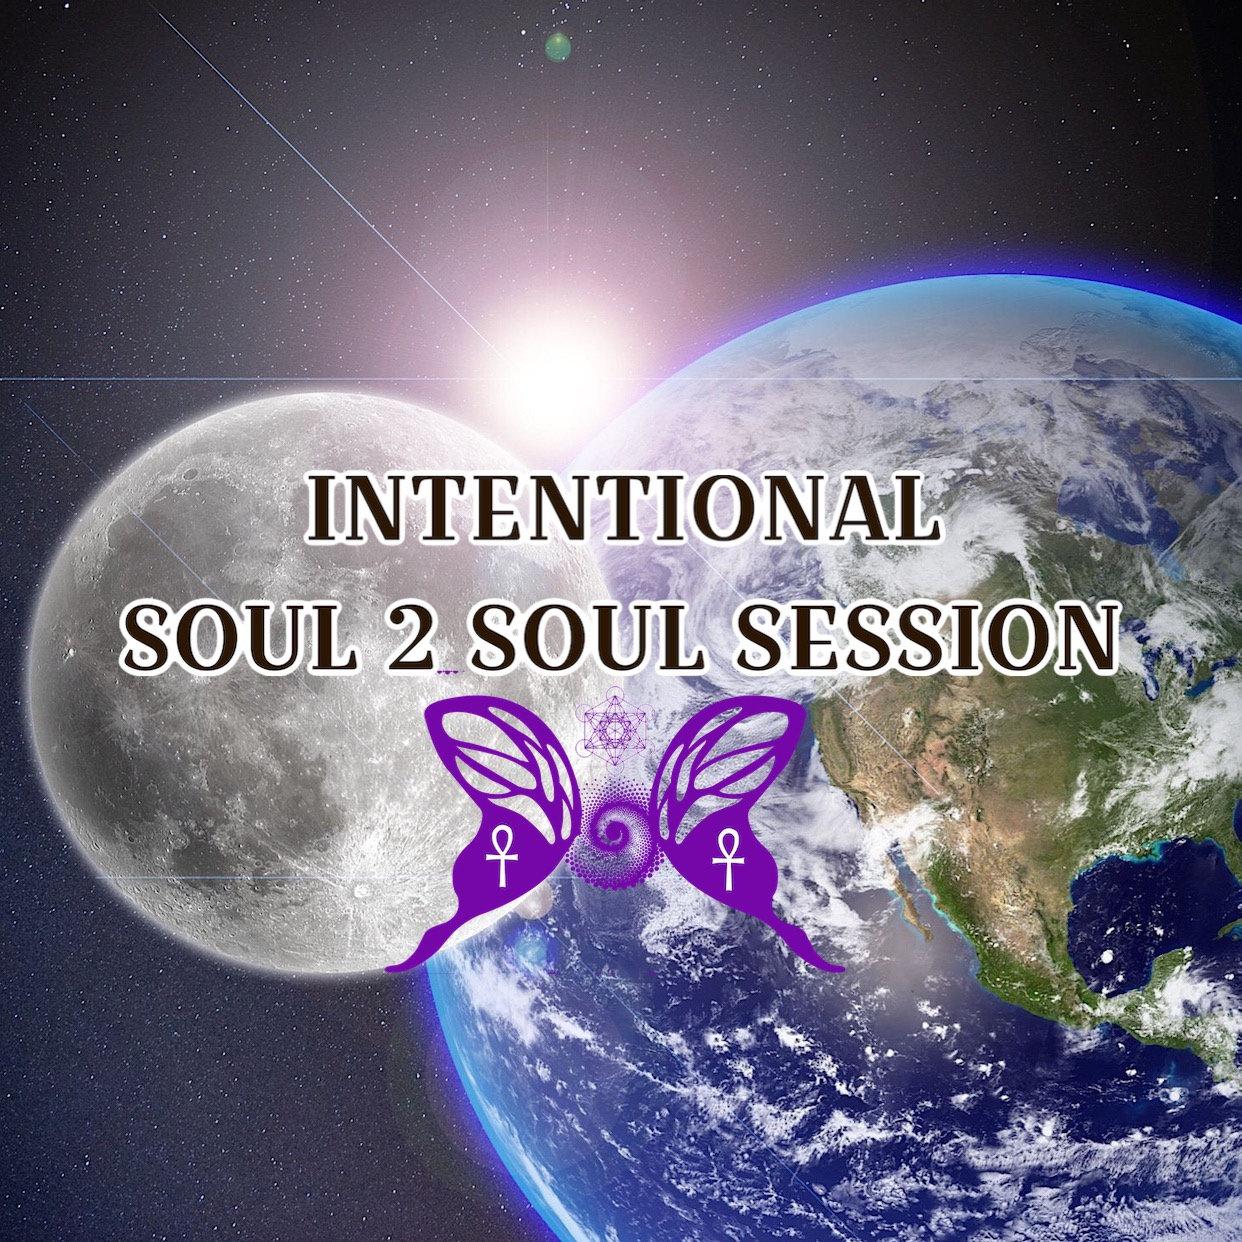 INTENTIONAL SOUL 2 SOUL SESSION